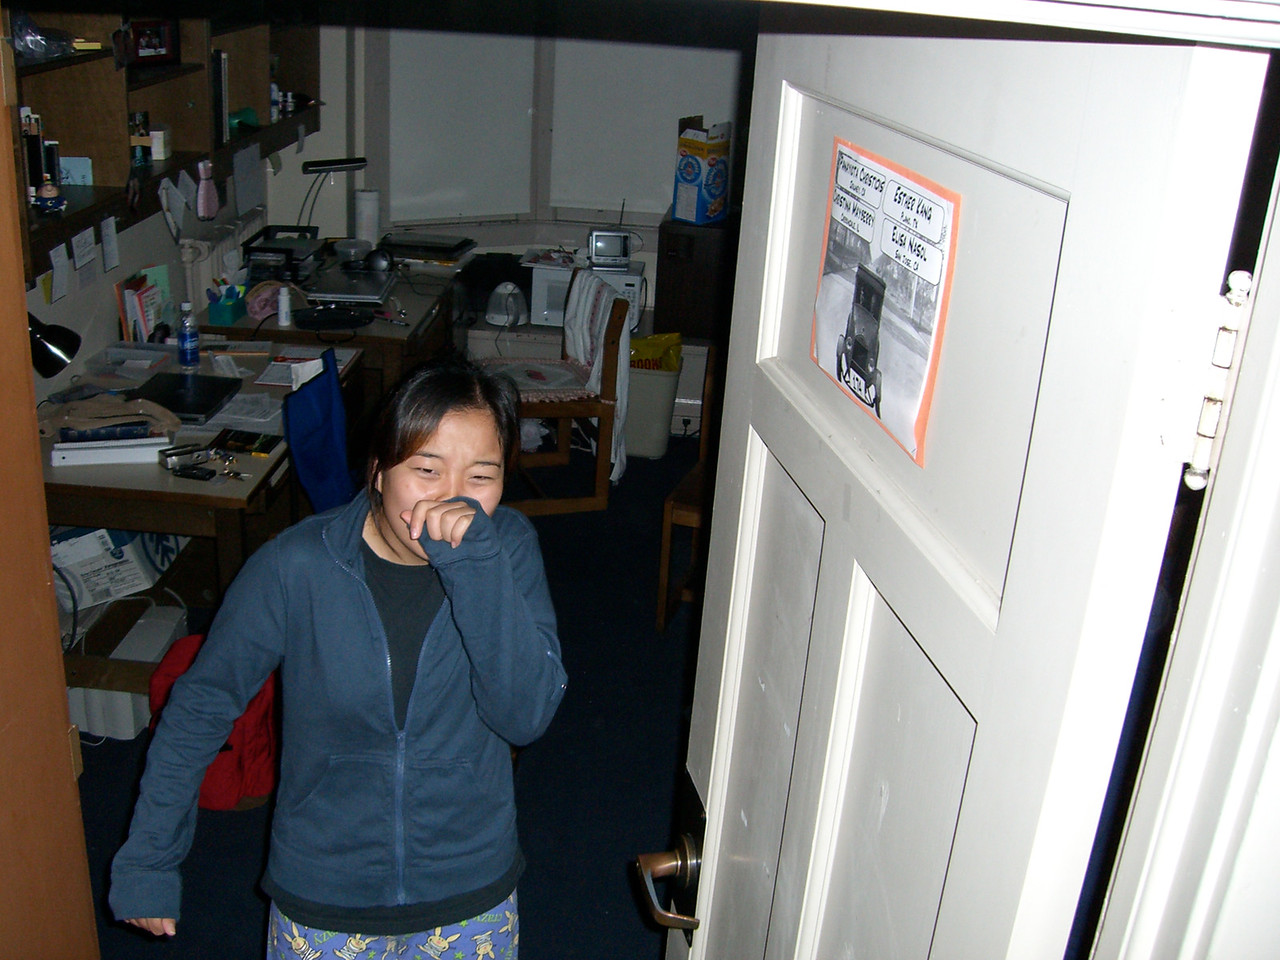 The 2nd - Esther Kang